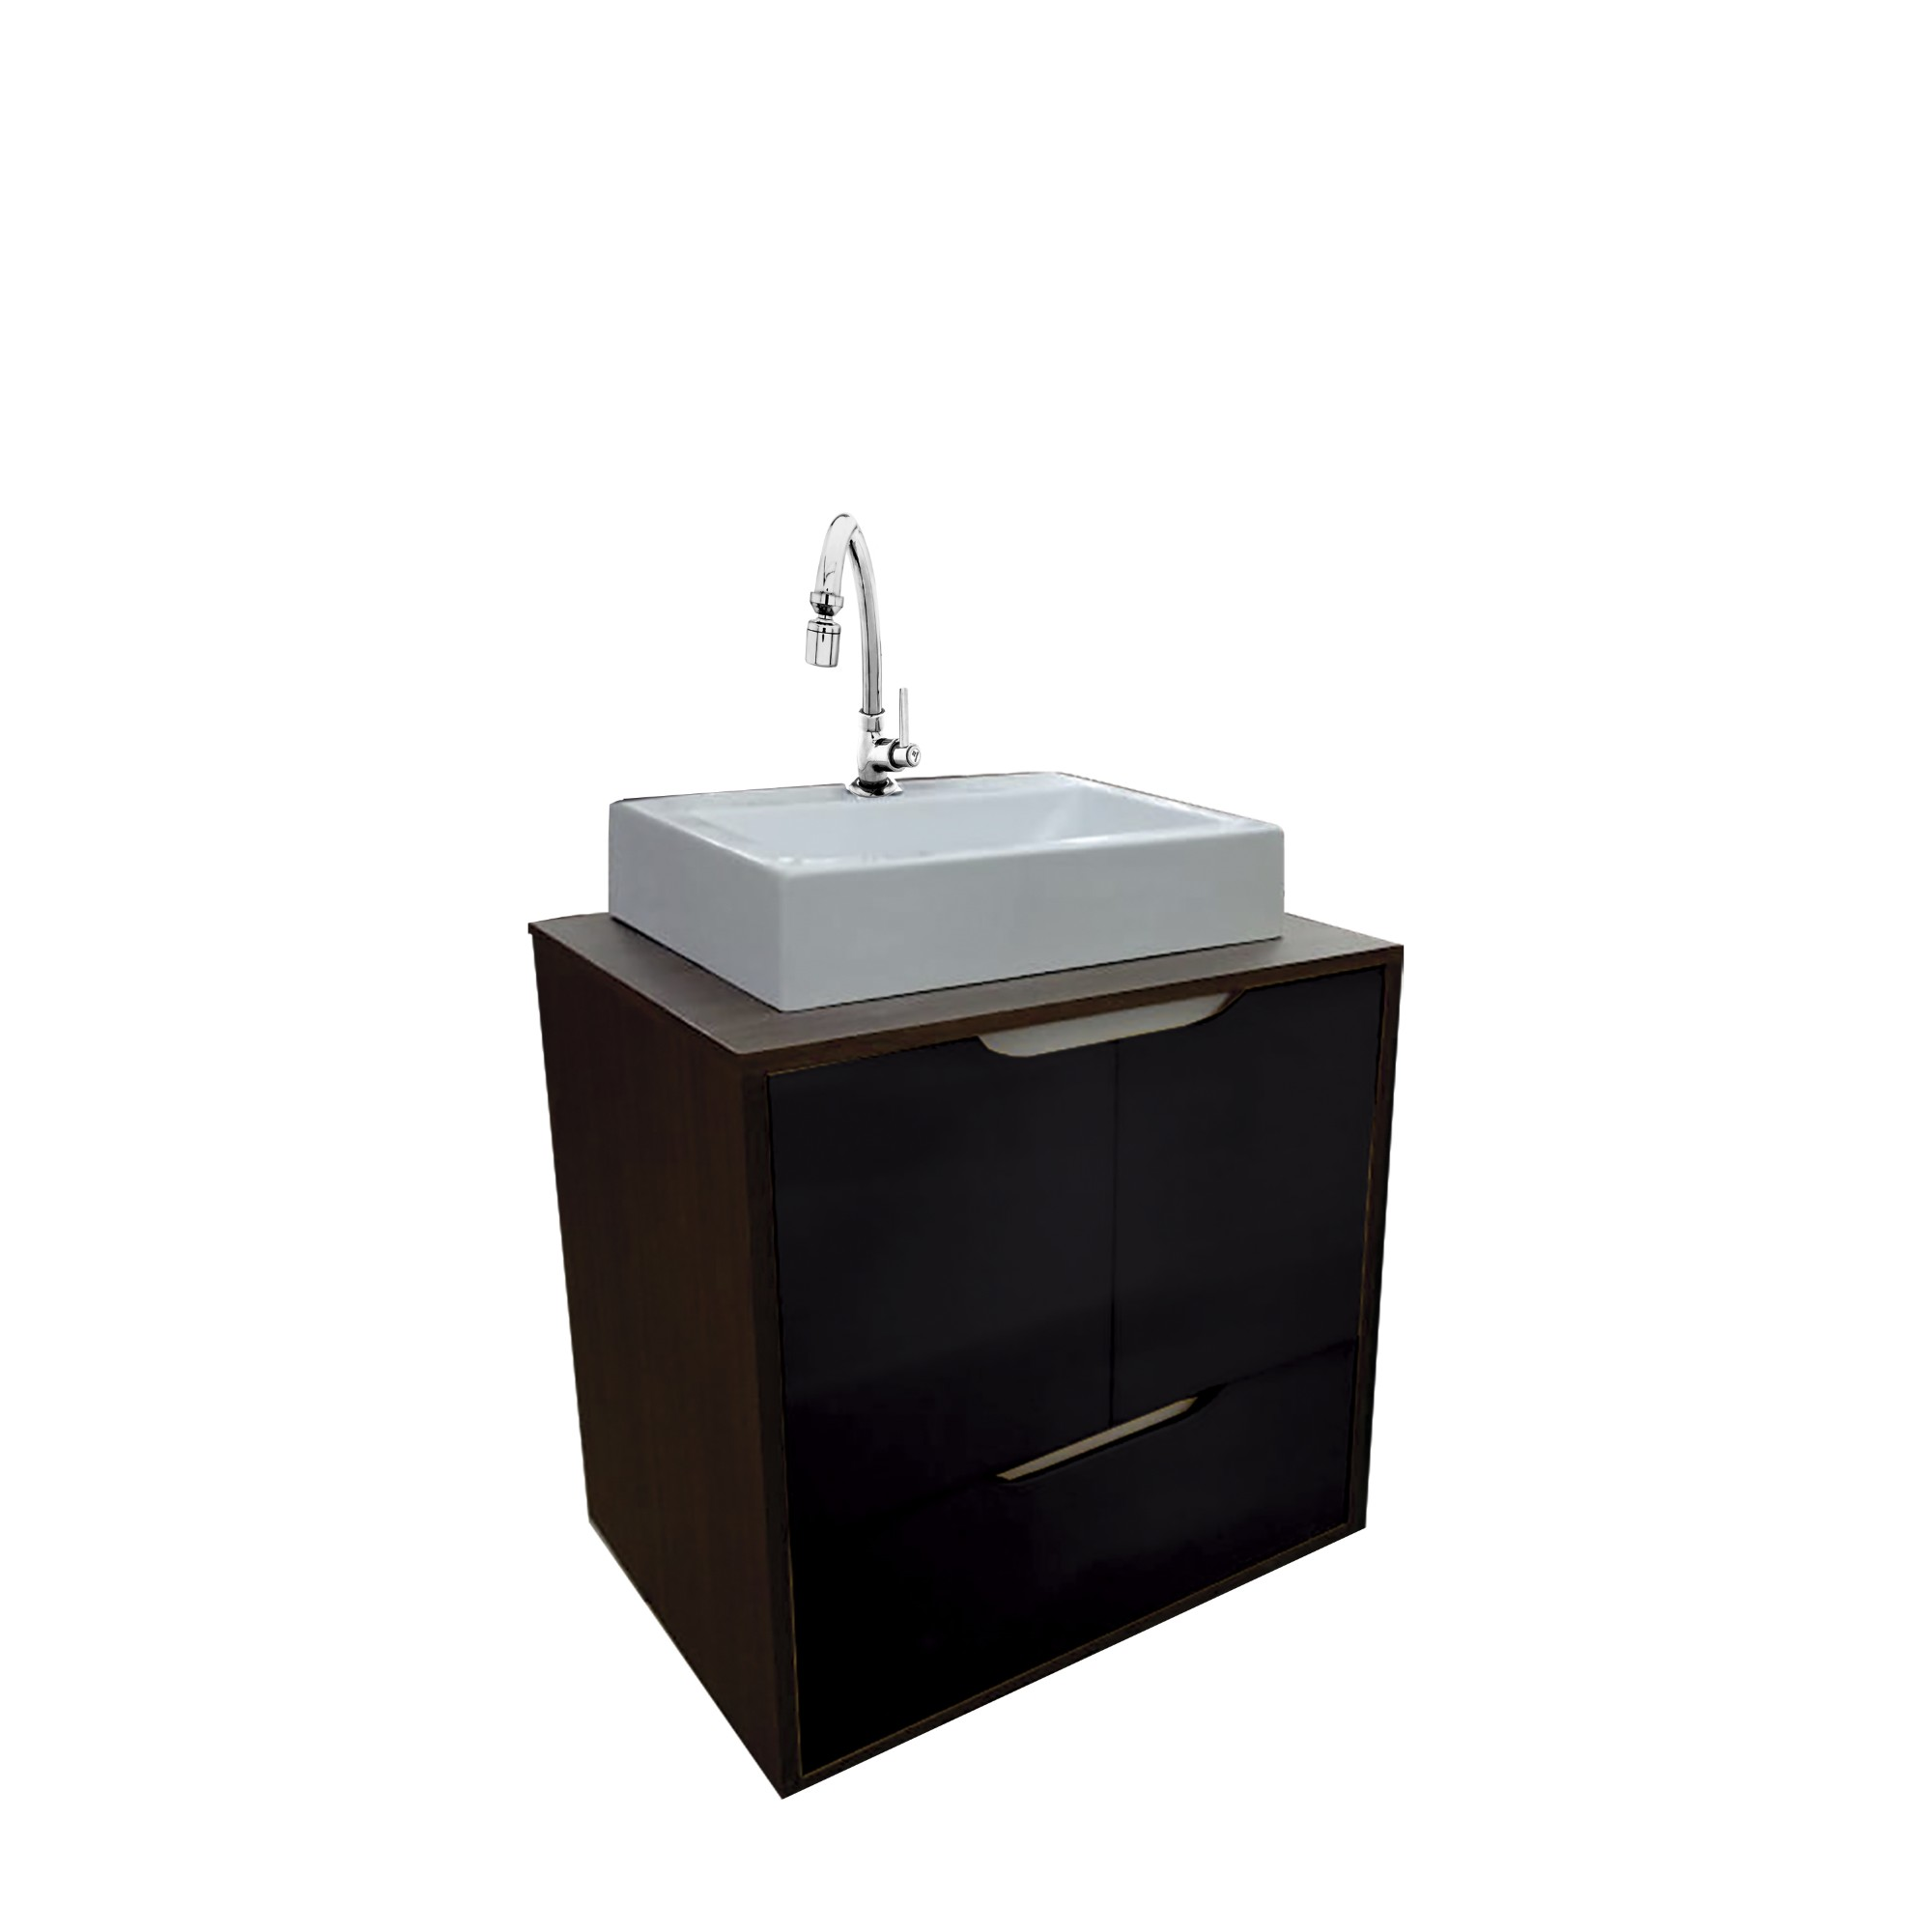 Gabinete para Banheiro 59x60cm Nogueira Allure 114010430 - Policlass